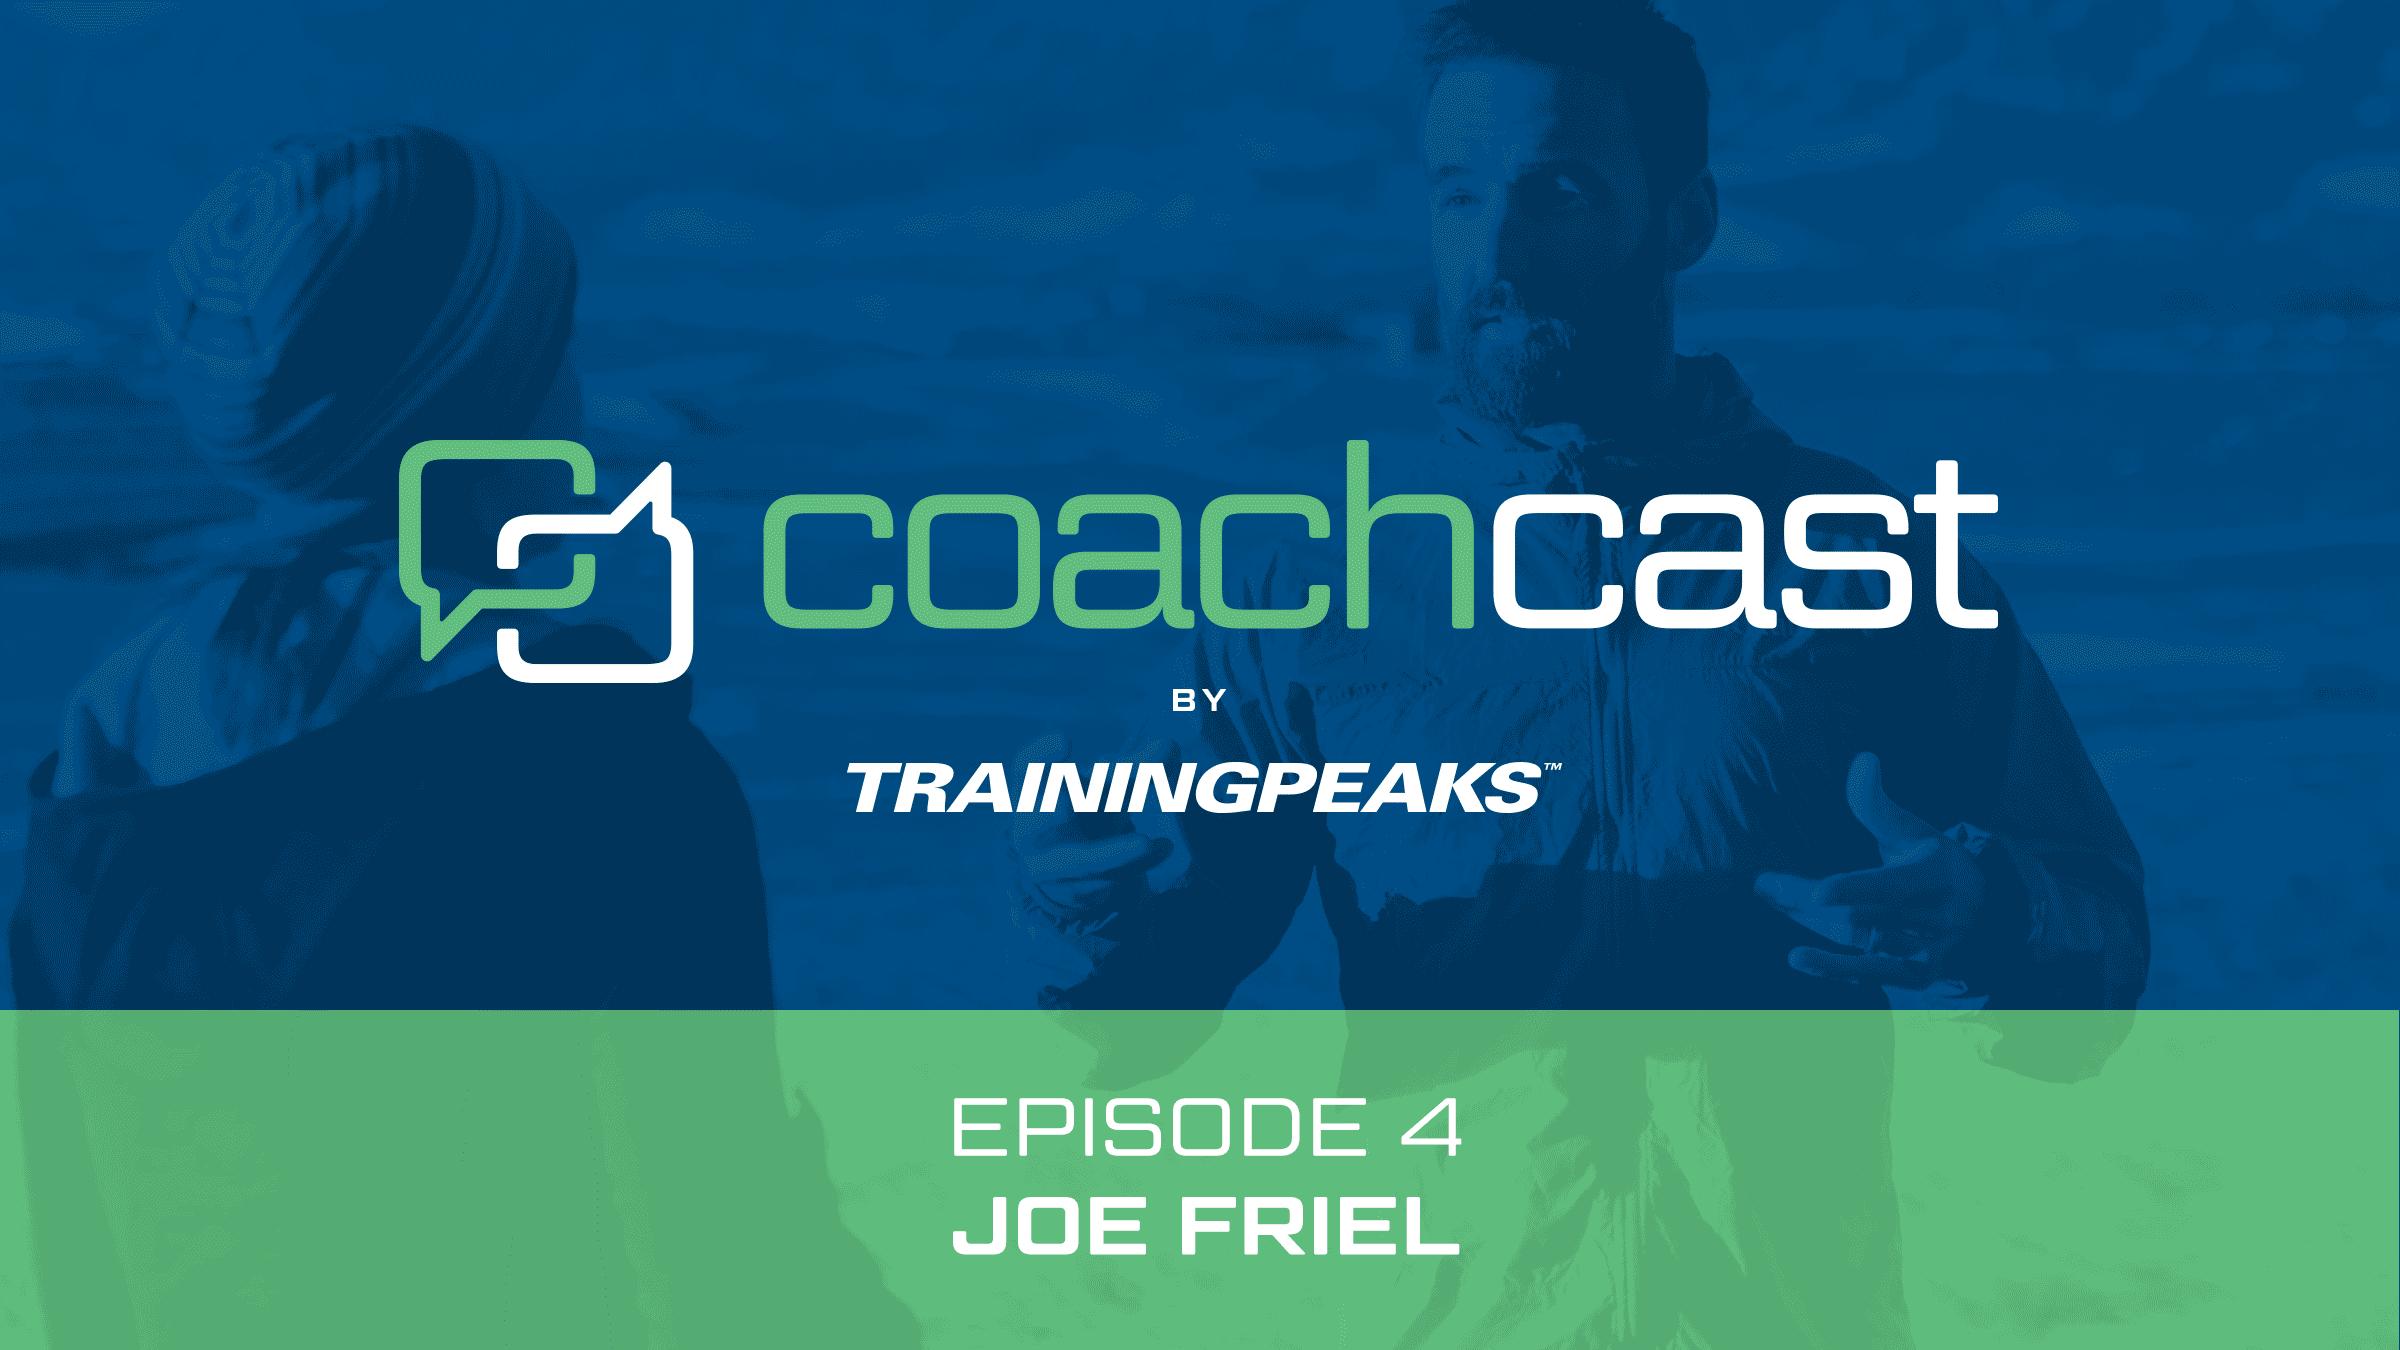 CoachCast: Coaching Advice with Joe Friel